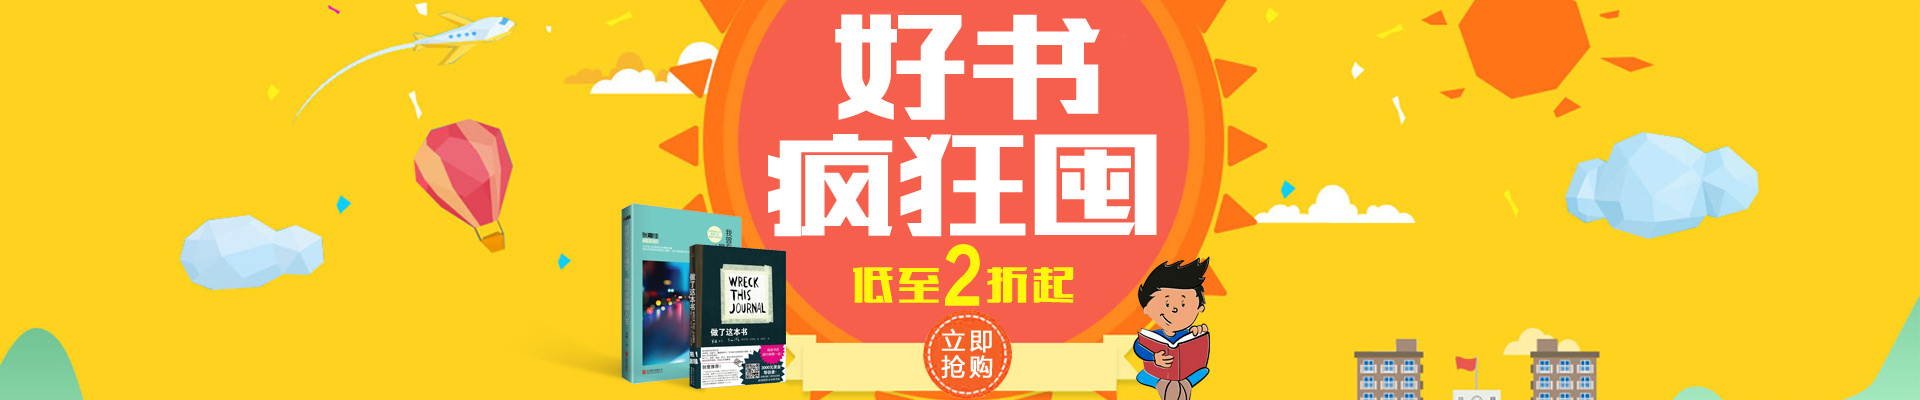 图书 海报 banner 广告(续) jkj8828